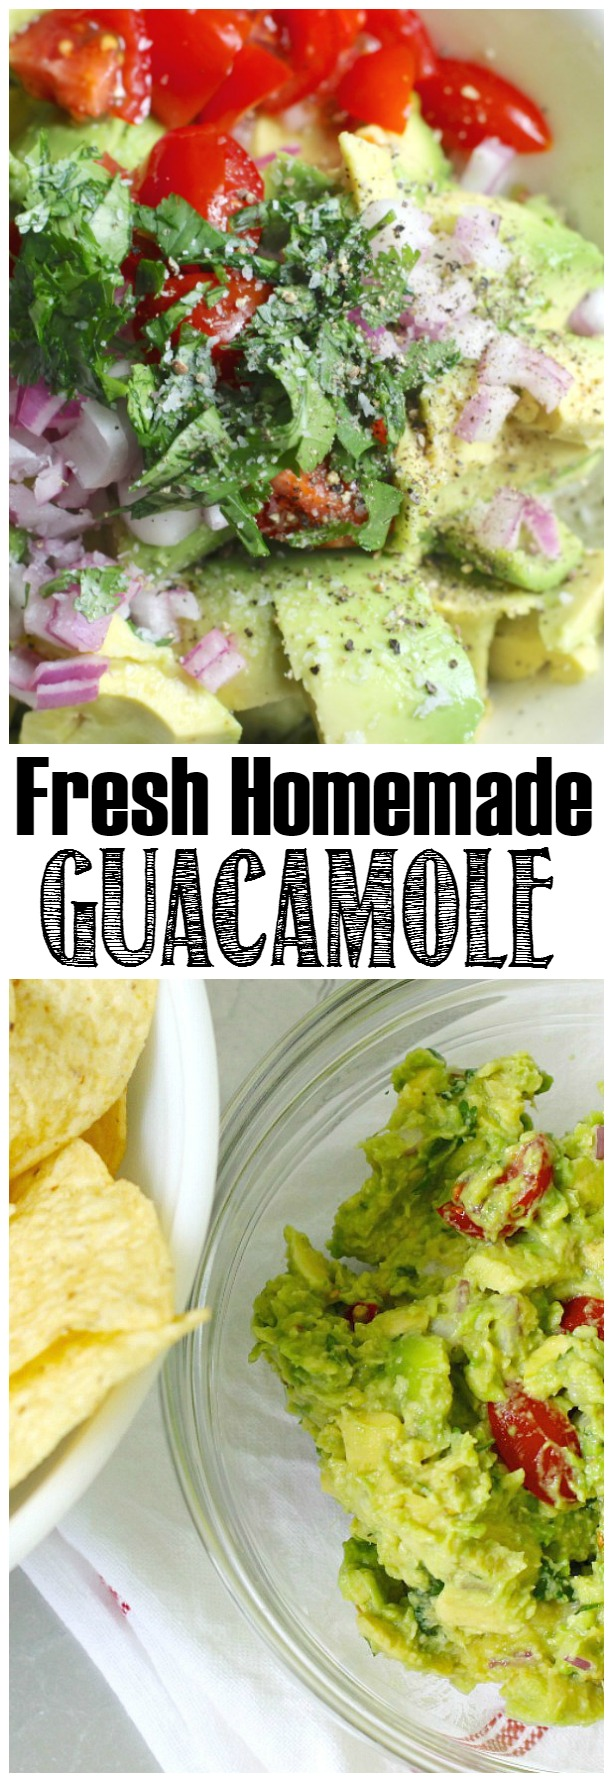 Fresh, homemade guacamole recipe. Yummy!!